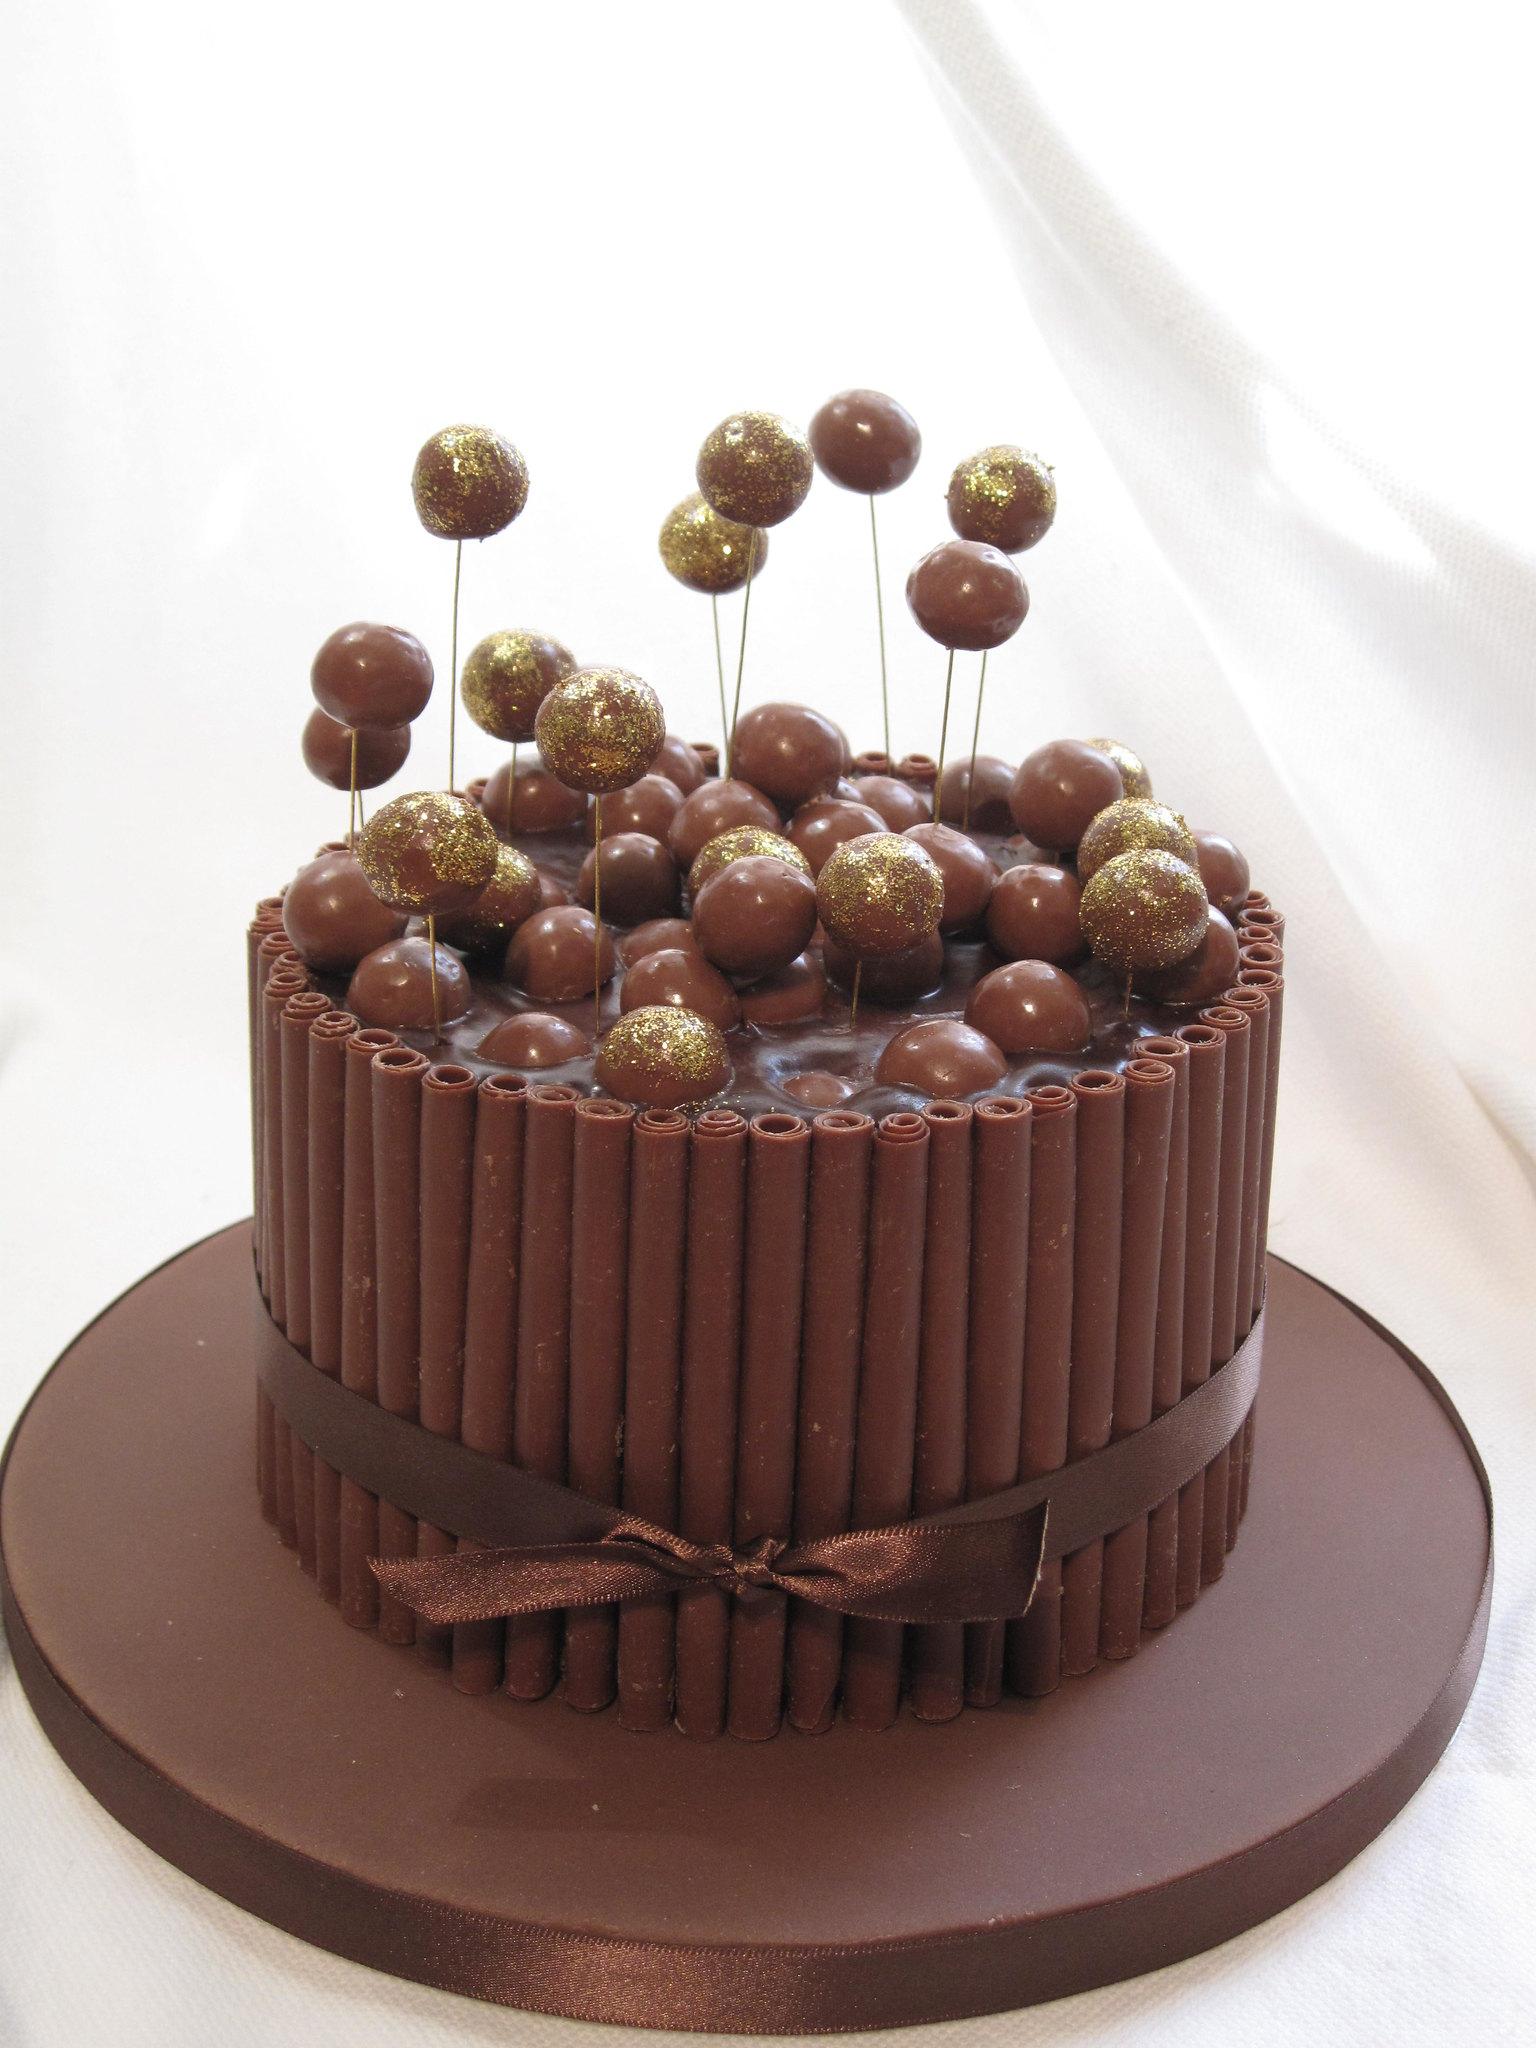 Chocolate malteser cake Flickr - Photo Sharing!